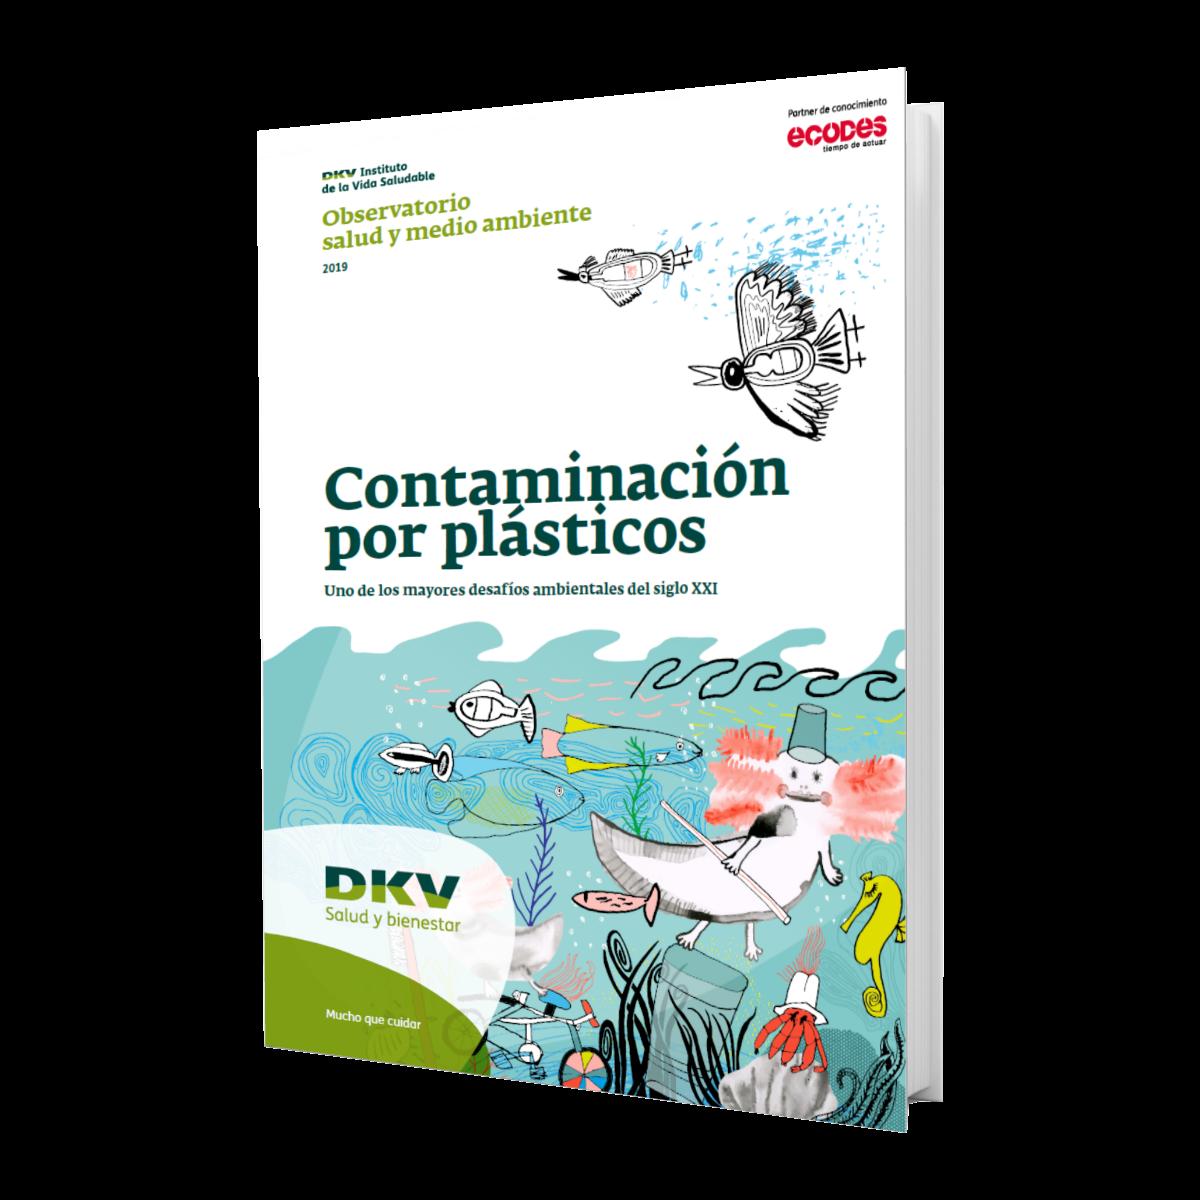 DKV - Contaminacion plastico - Portada3D